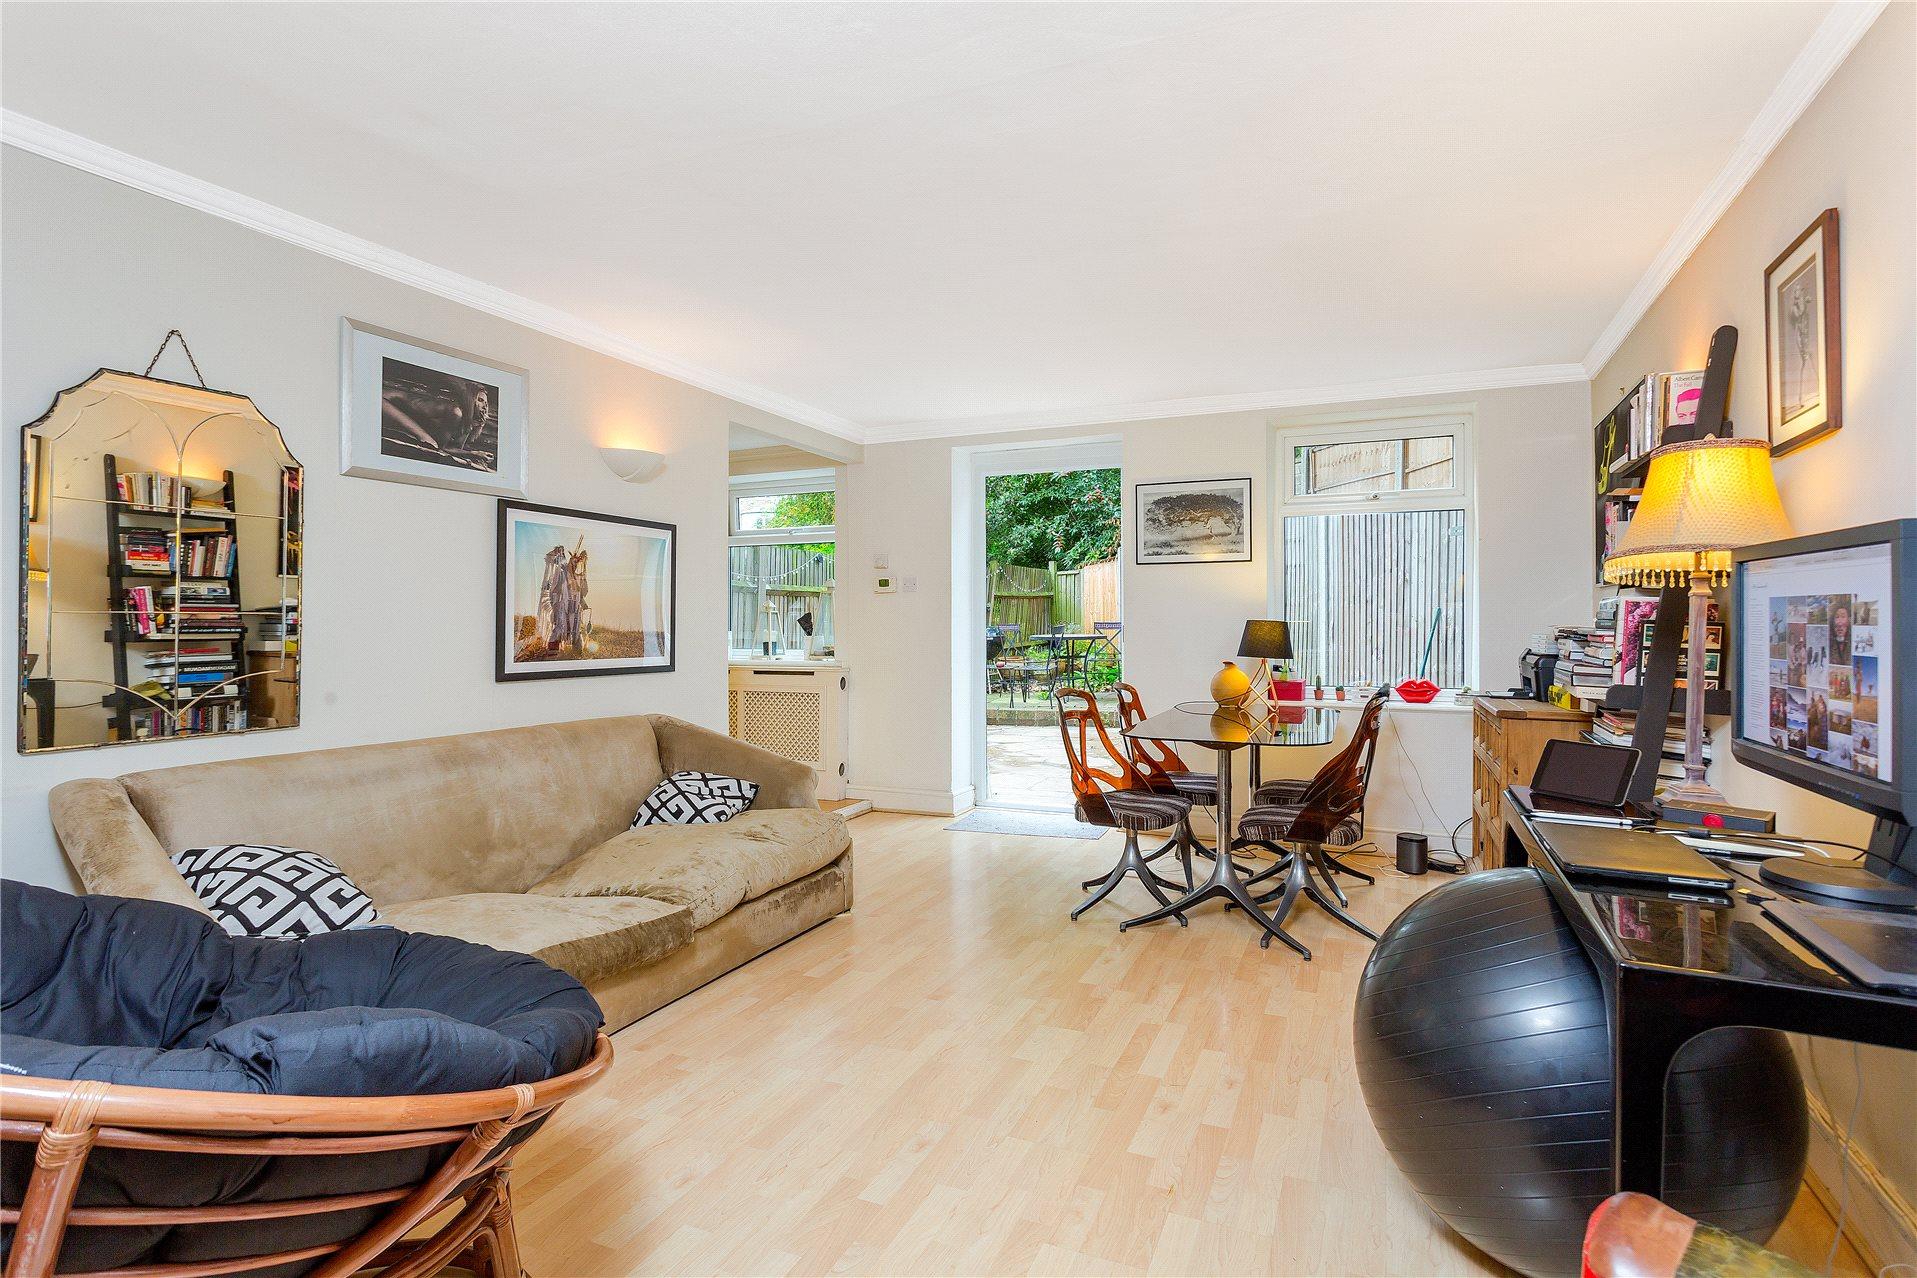 3 Bedrooms Flat for sale in Primrose Gardens, Belsize Park, London, NW3